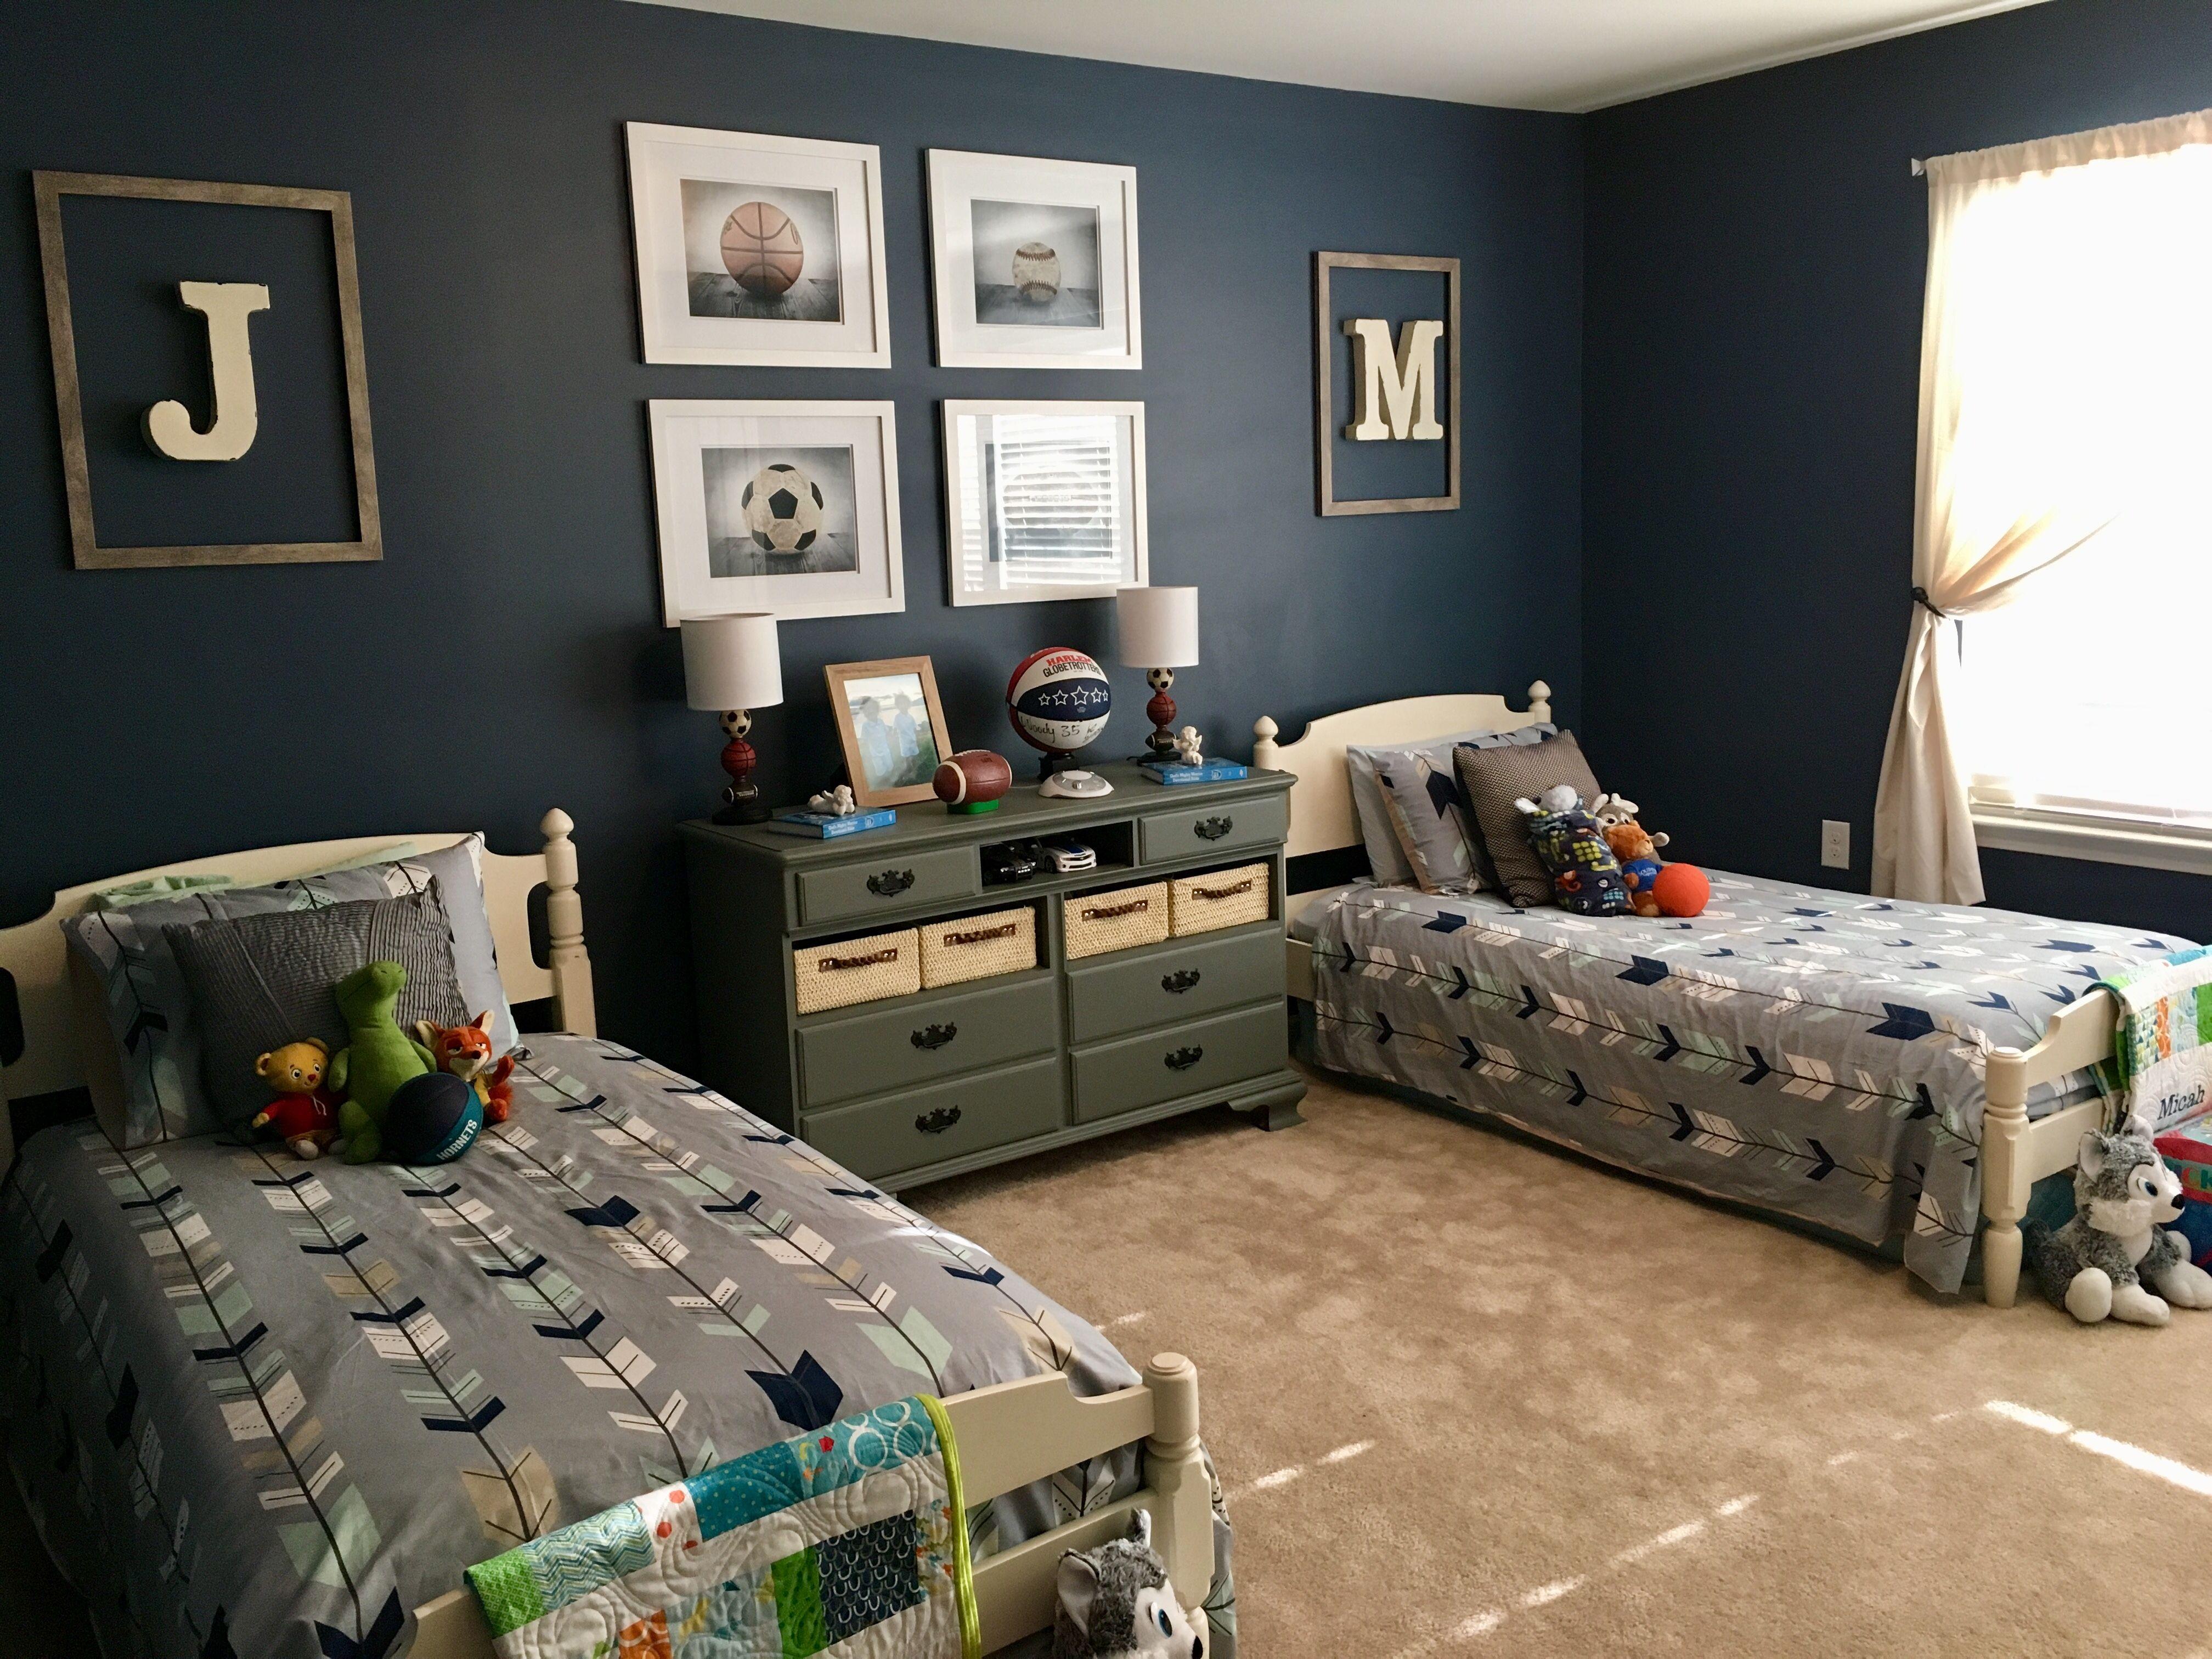 exciting twin boys bedroom ideas | Twin Room in 2019 | Boy room, Boys room decor, Kids bedroom